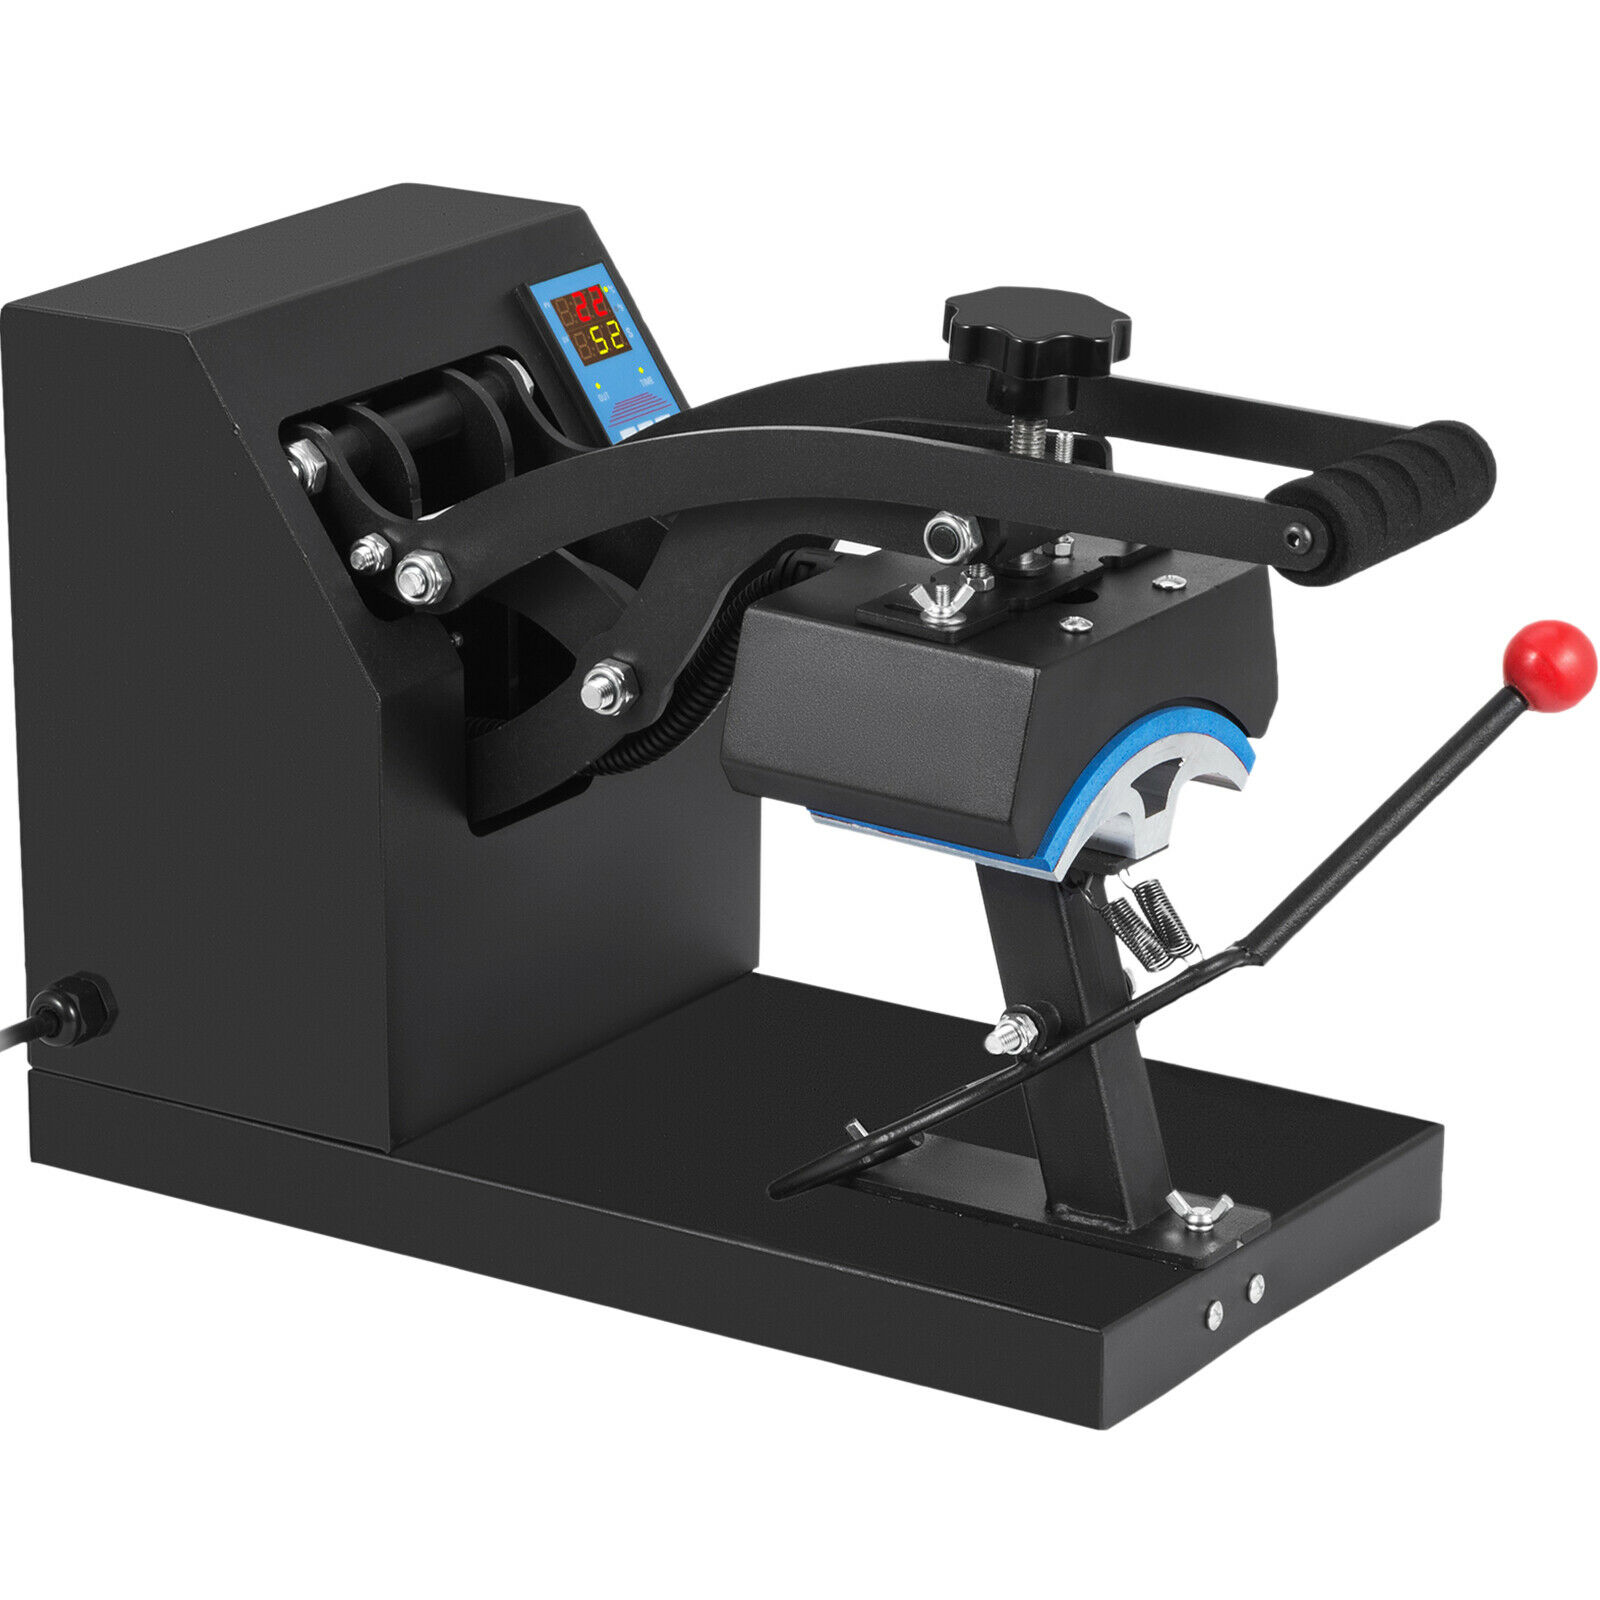 Hut Kappe Sublimation Maschine Wärme Presse Transfer Digitale Clamshell 7x3.5